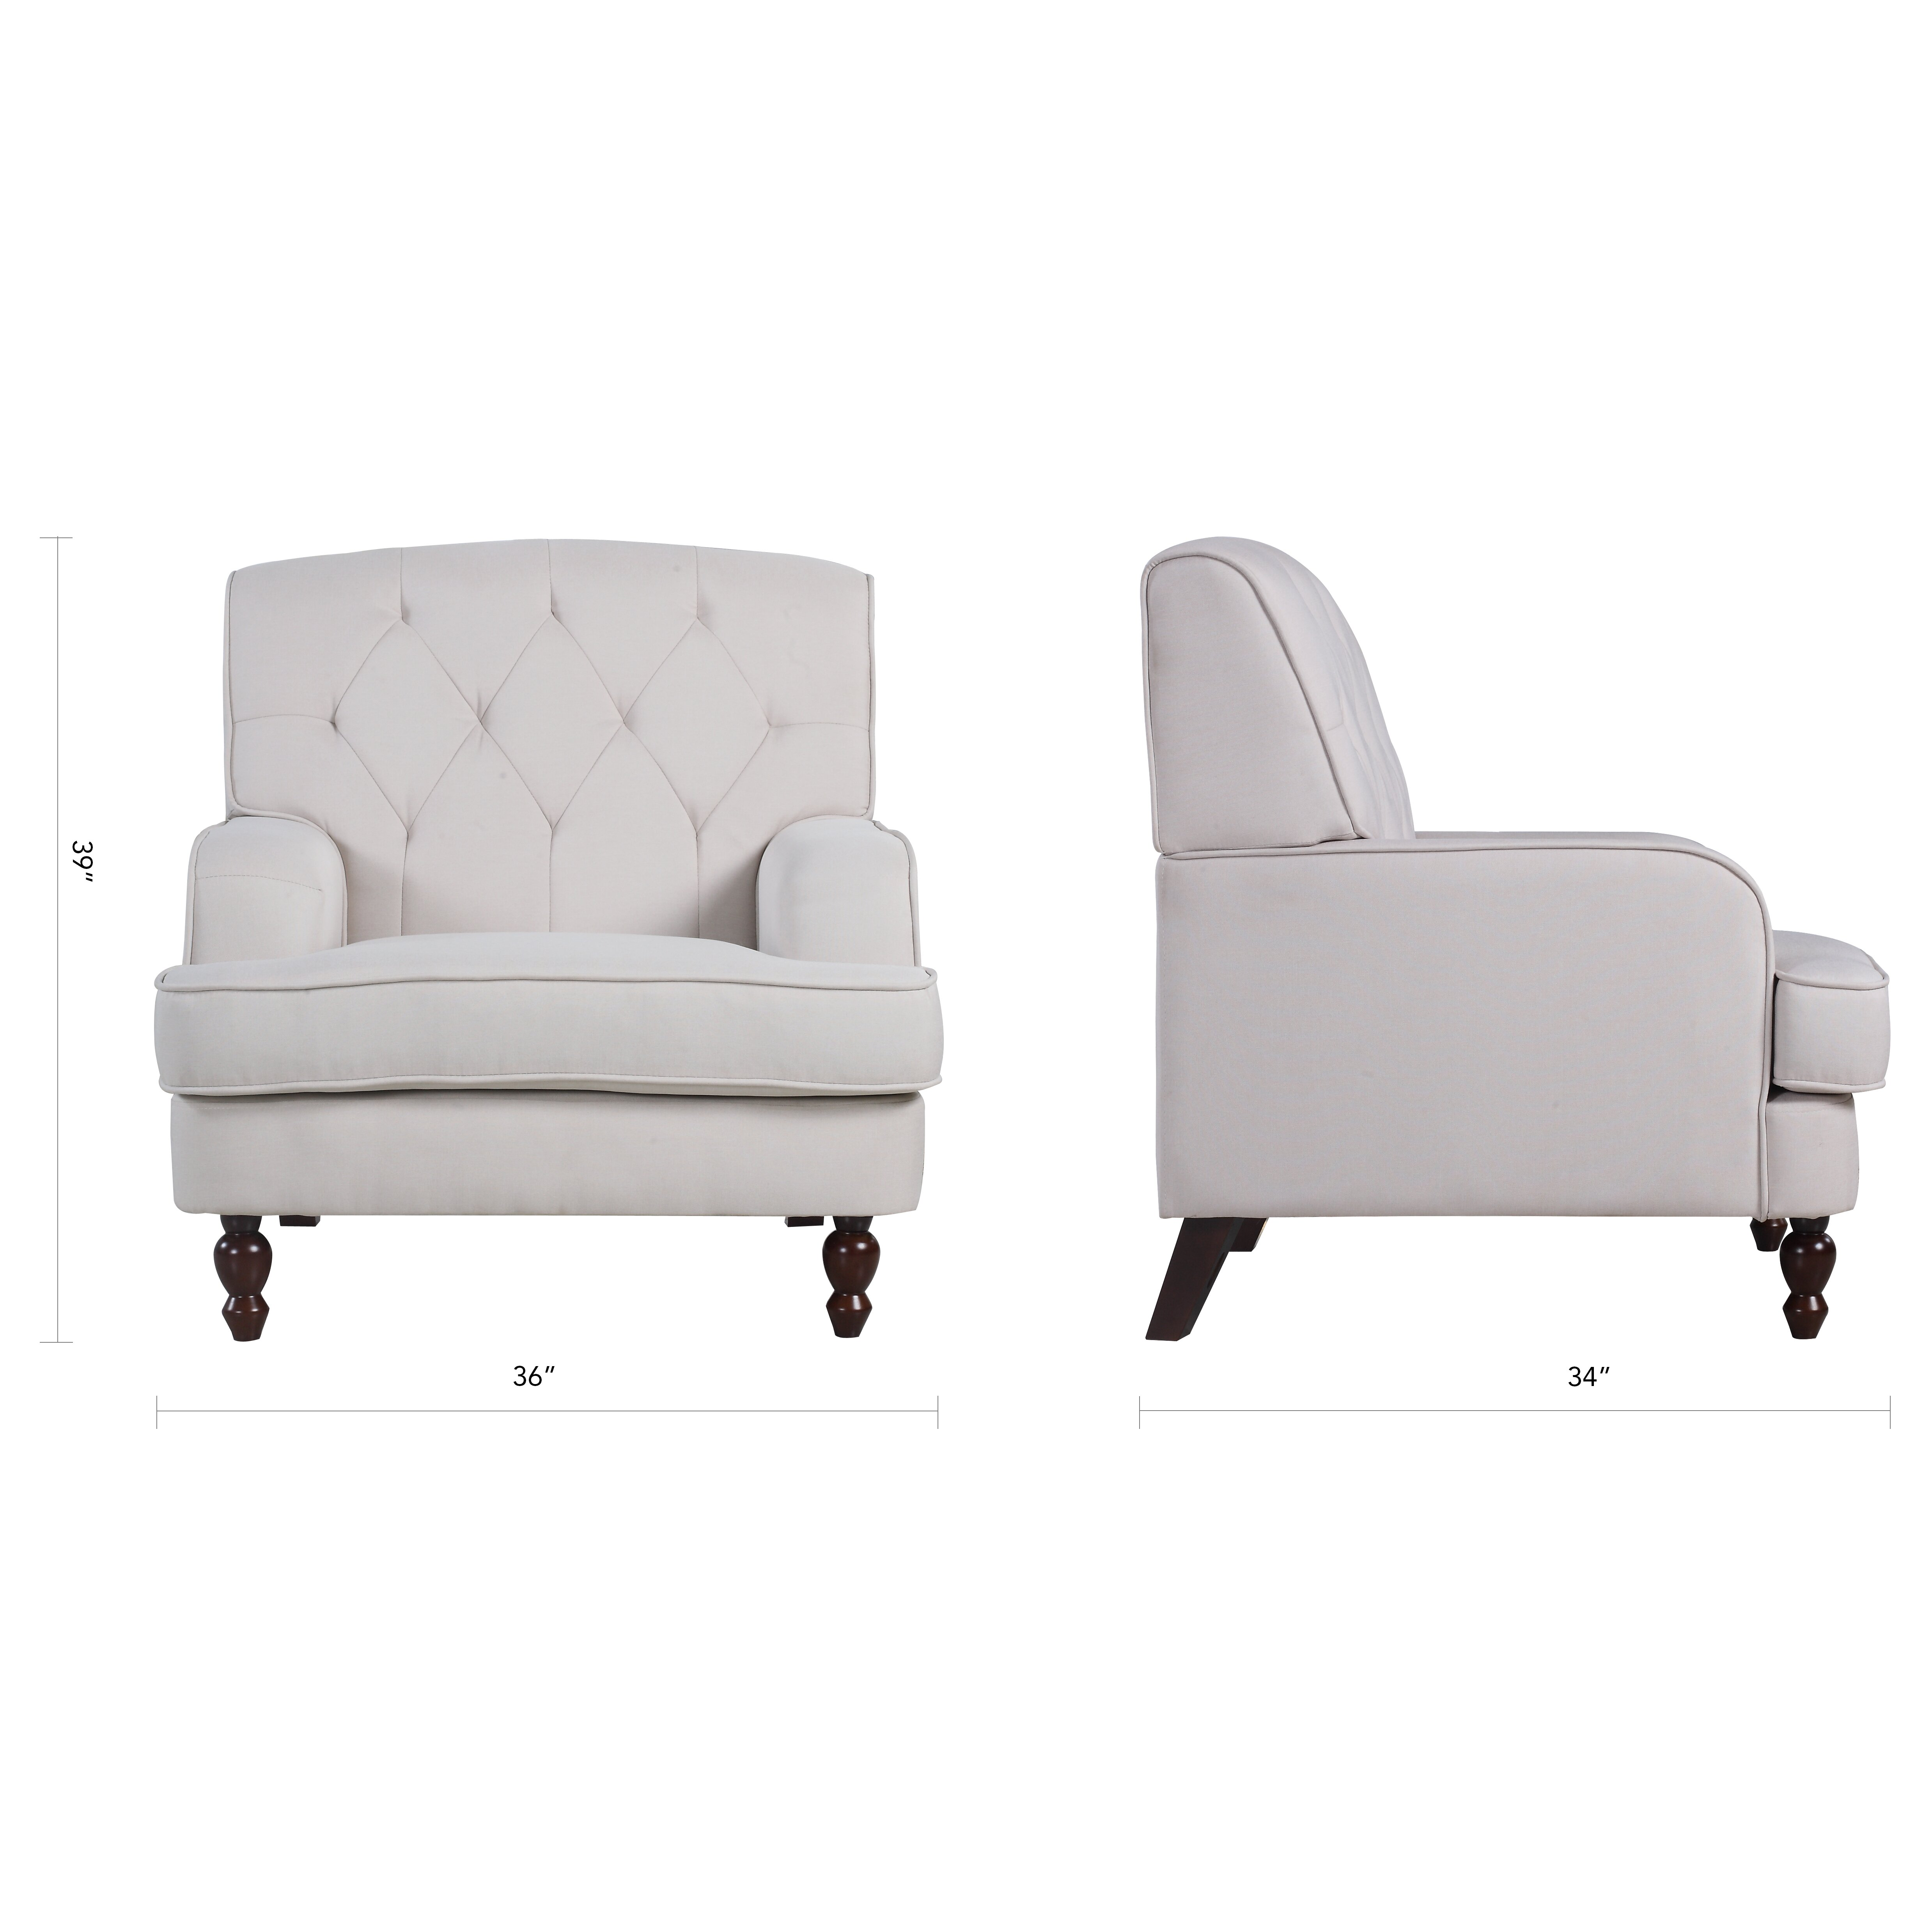 Living Room Arm Chairs Madison Home Usa Modern Tufted Fabric Living Room Arm Chair